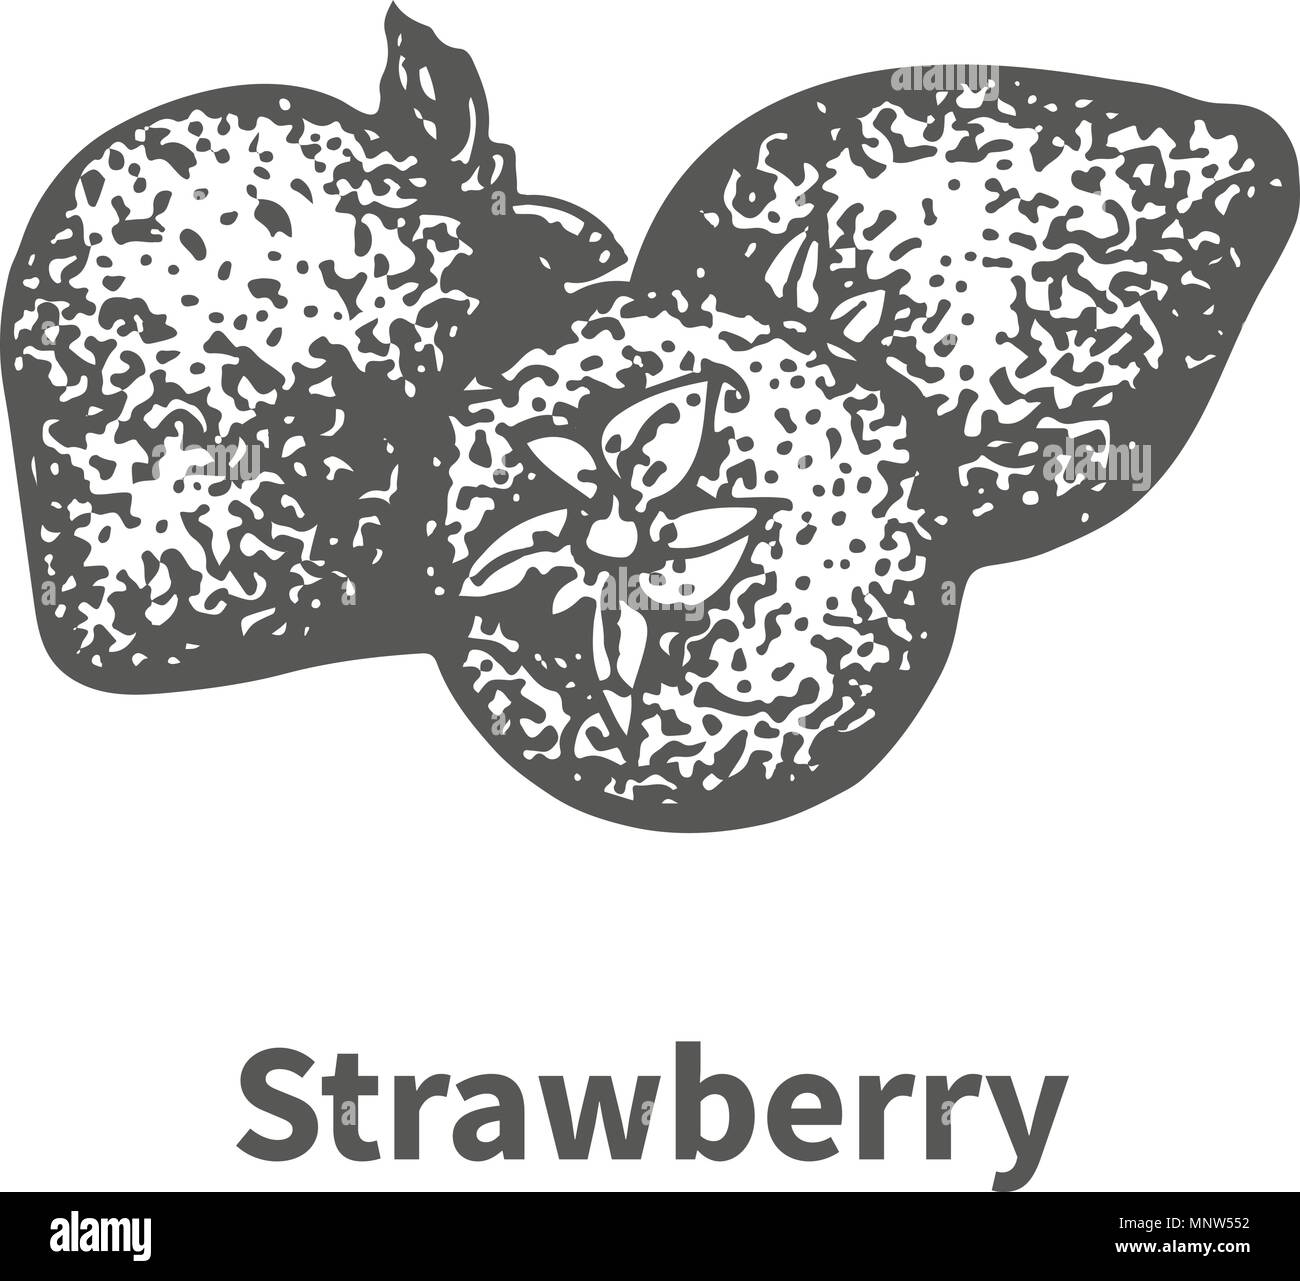 Vector illustration hand-drawn strawberry - Stock Image